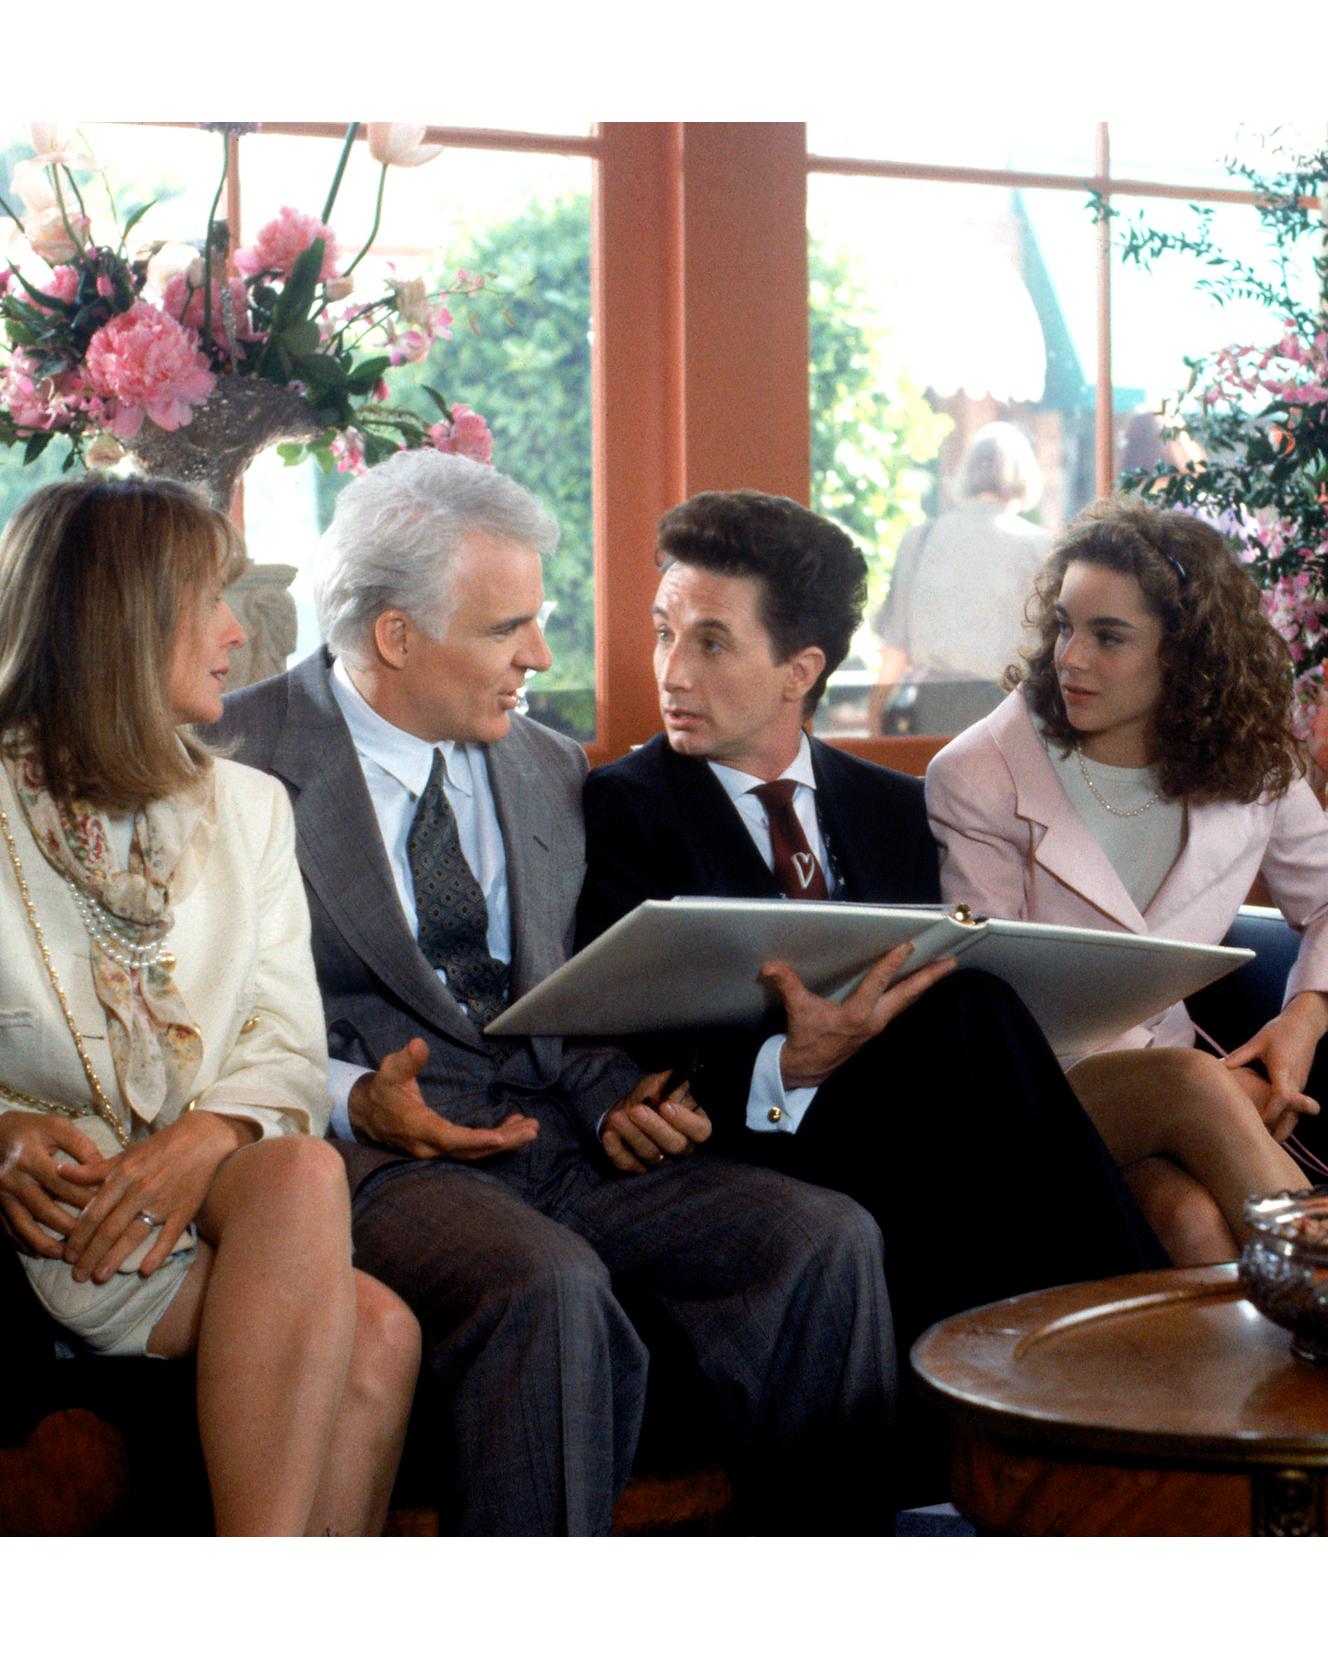 father-of-the-bride-movie-wedding-planning-0116.jpg